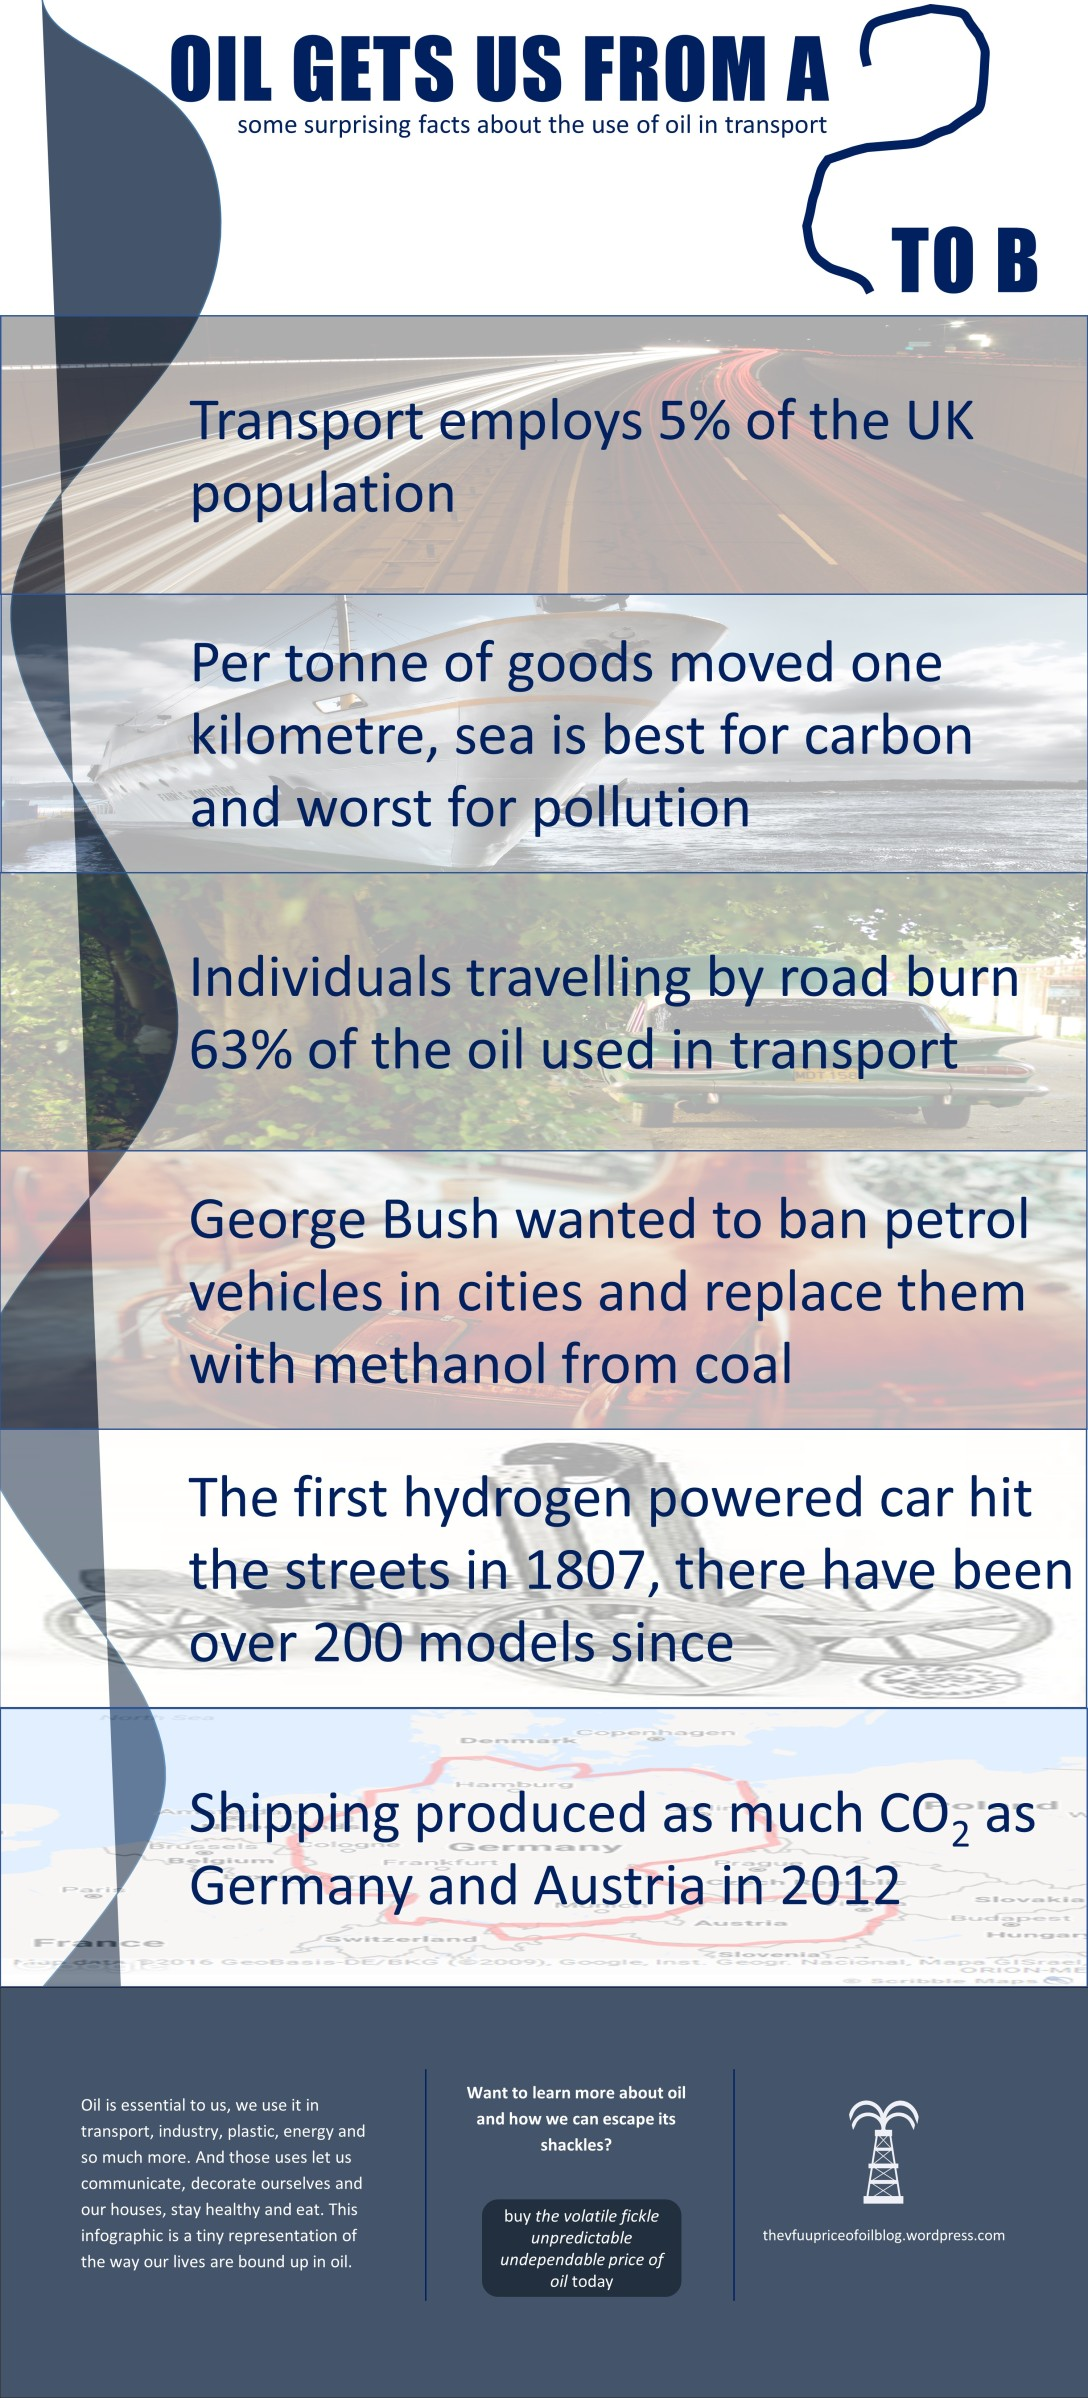 infographic-oilgetsusfromatob